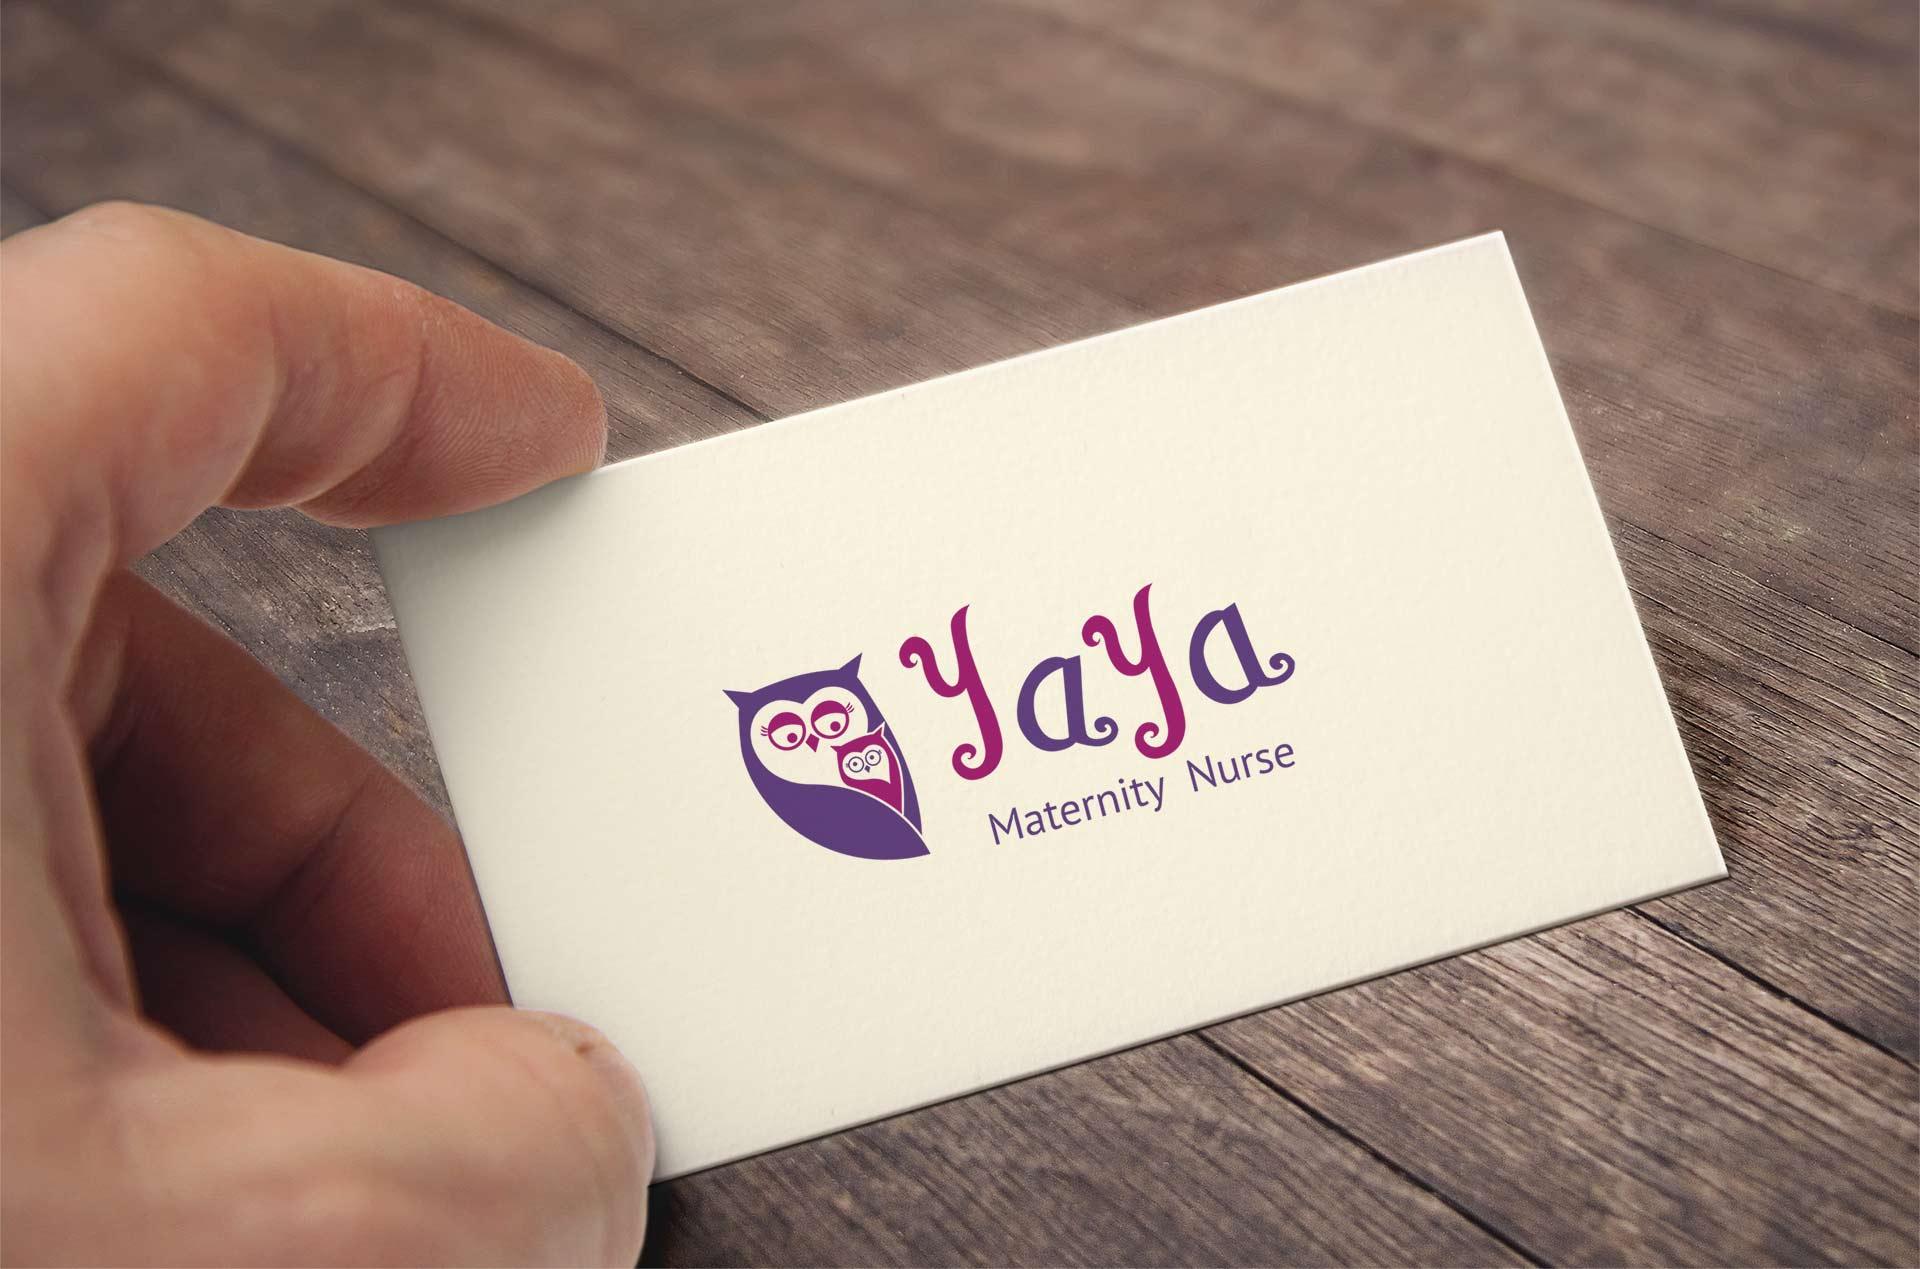 Business-Card_Yaya-Maternity-Nurse